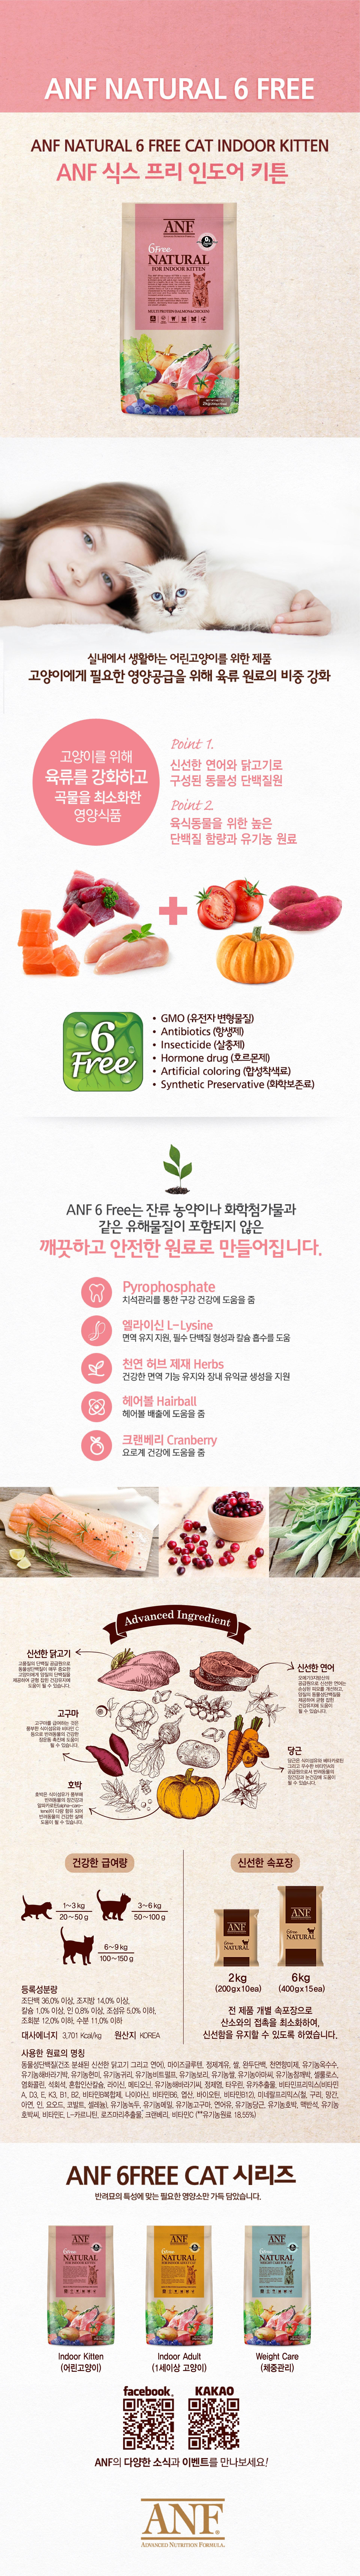 ANF 6Free 캣 인도어 키튼 (2kg/6kg)-상품이미지-0